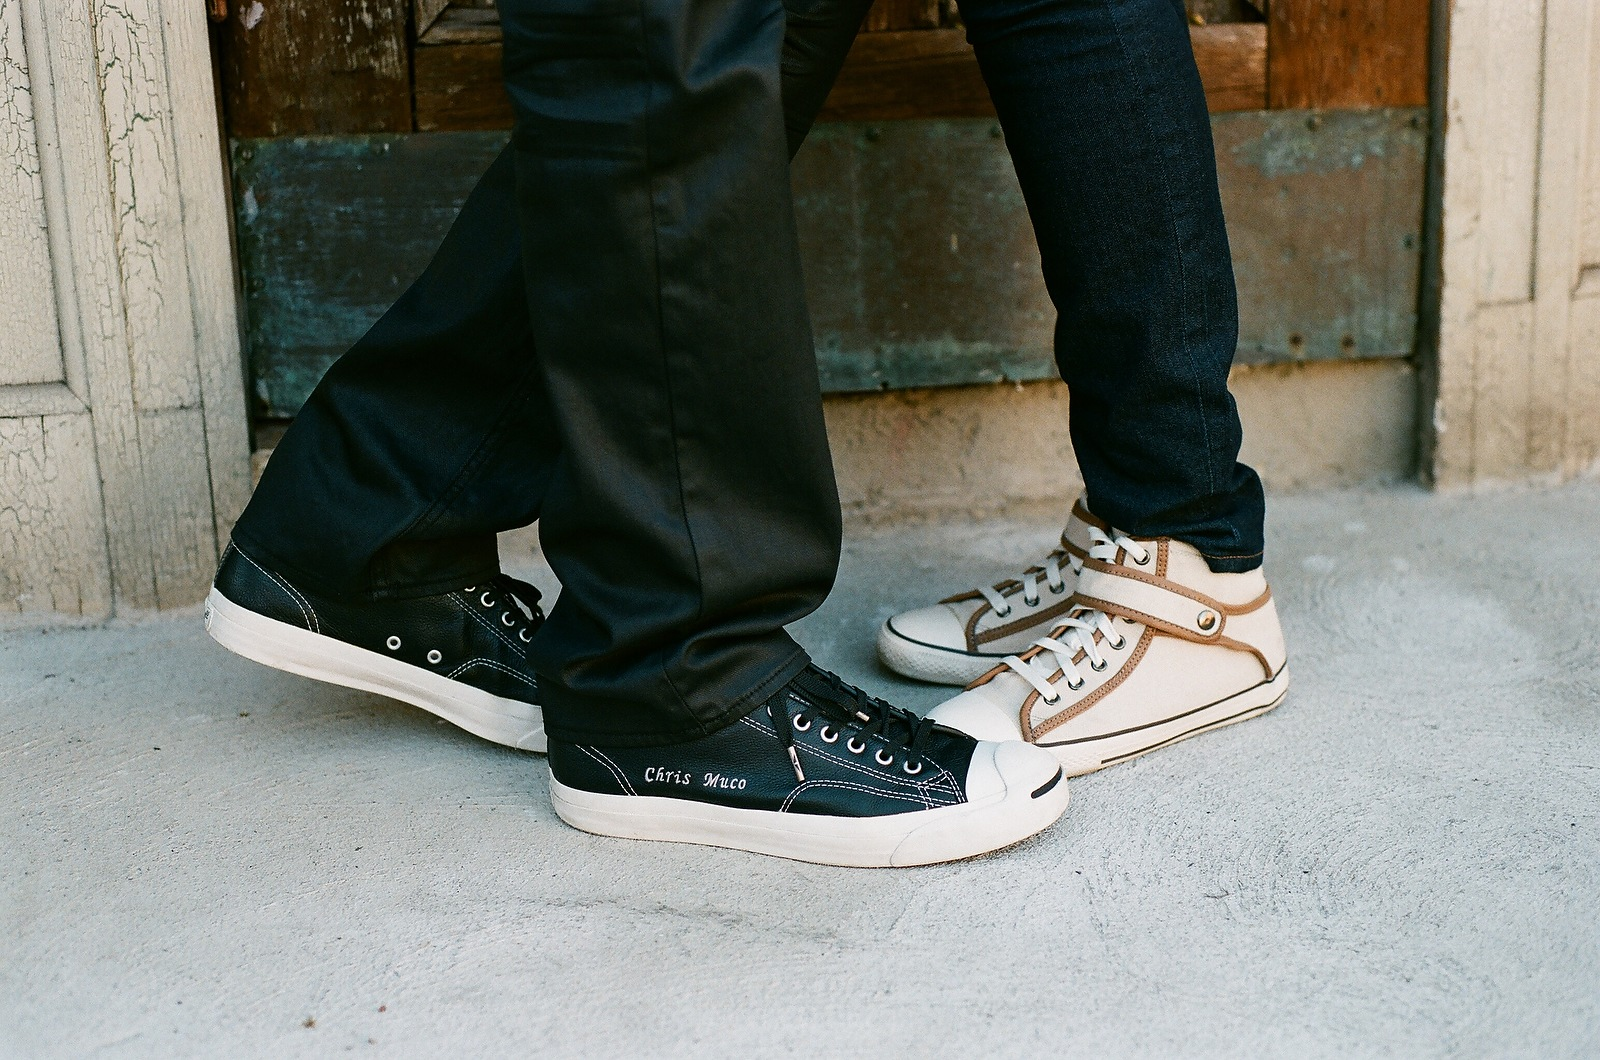 engaged couple's feet wearing custom chuck taylor all stars